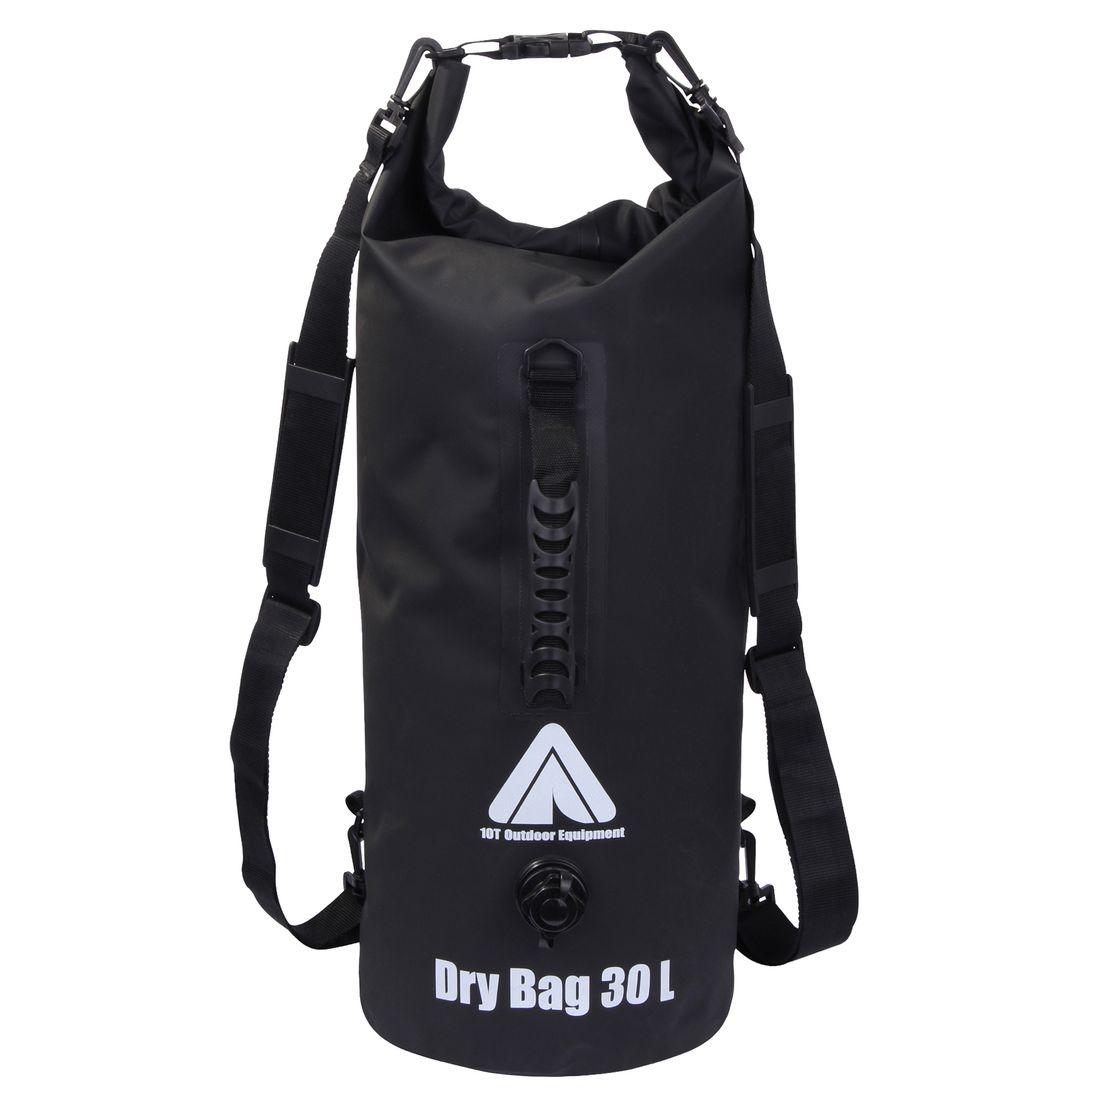 10t Dry Bag 30 L Waterproof Backpack Duffel Storage With Shoulder Straps Carrying Handle Outdoor Equipment Bags Packsacks